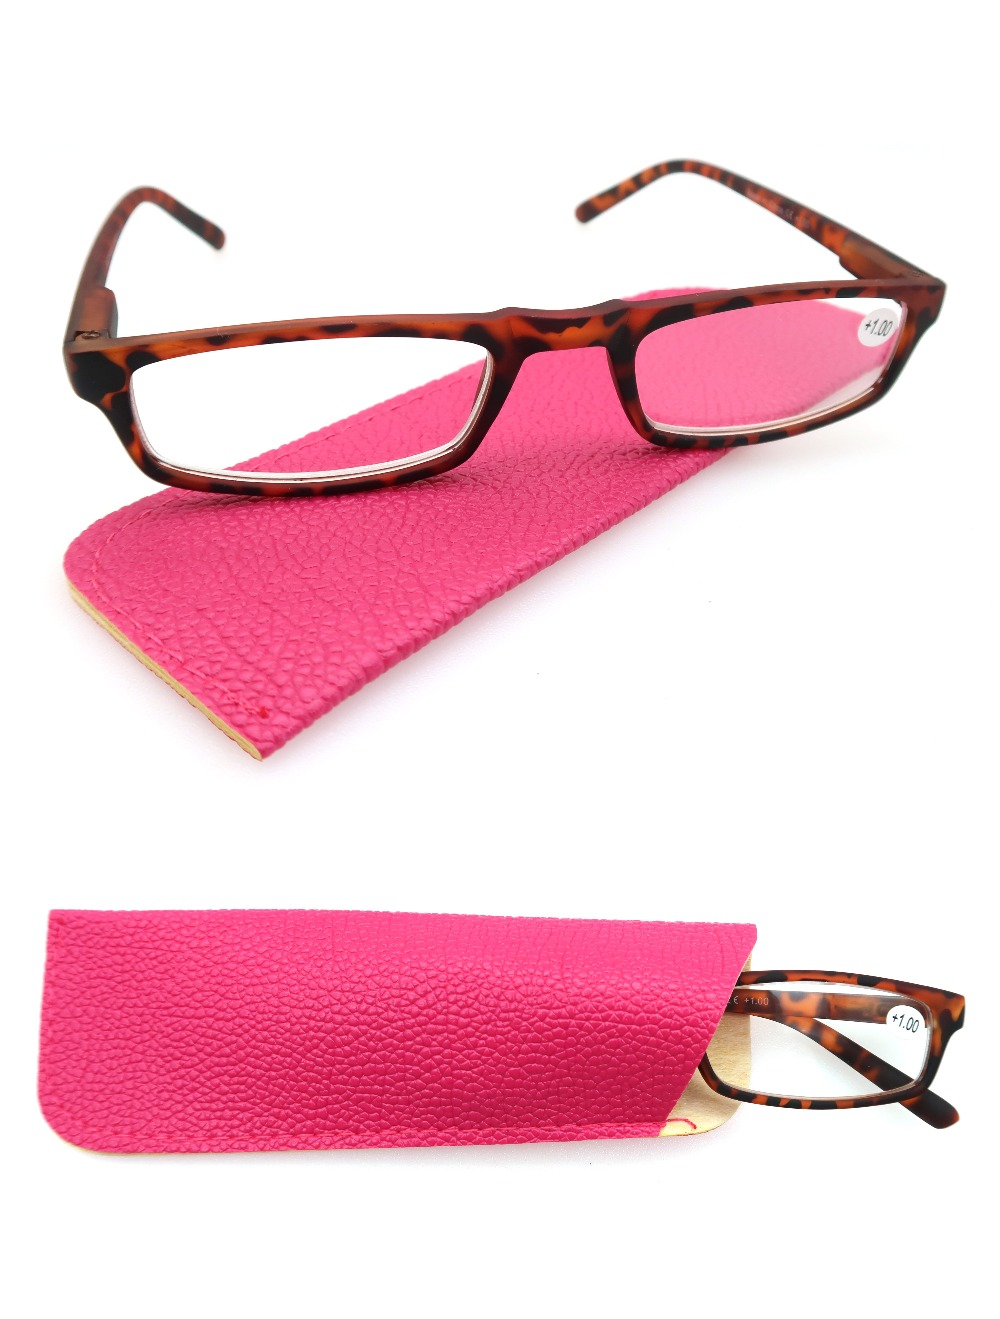 optical glasses for reading4